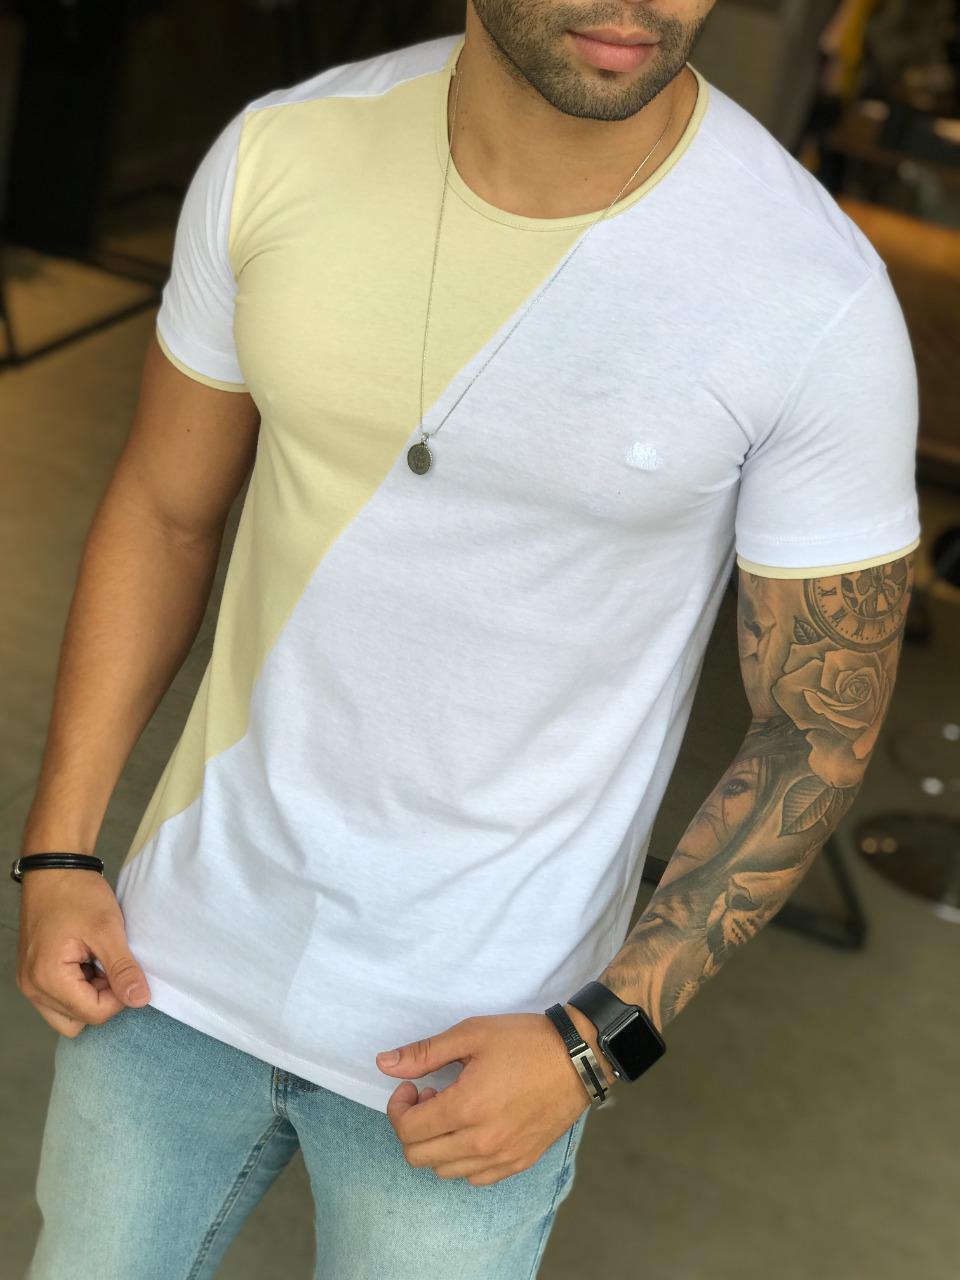 Camiseta M Artt Dual Branca e Amarela  - Harpia Moda - Moda Masculina & Acessórios